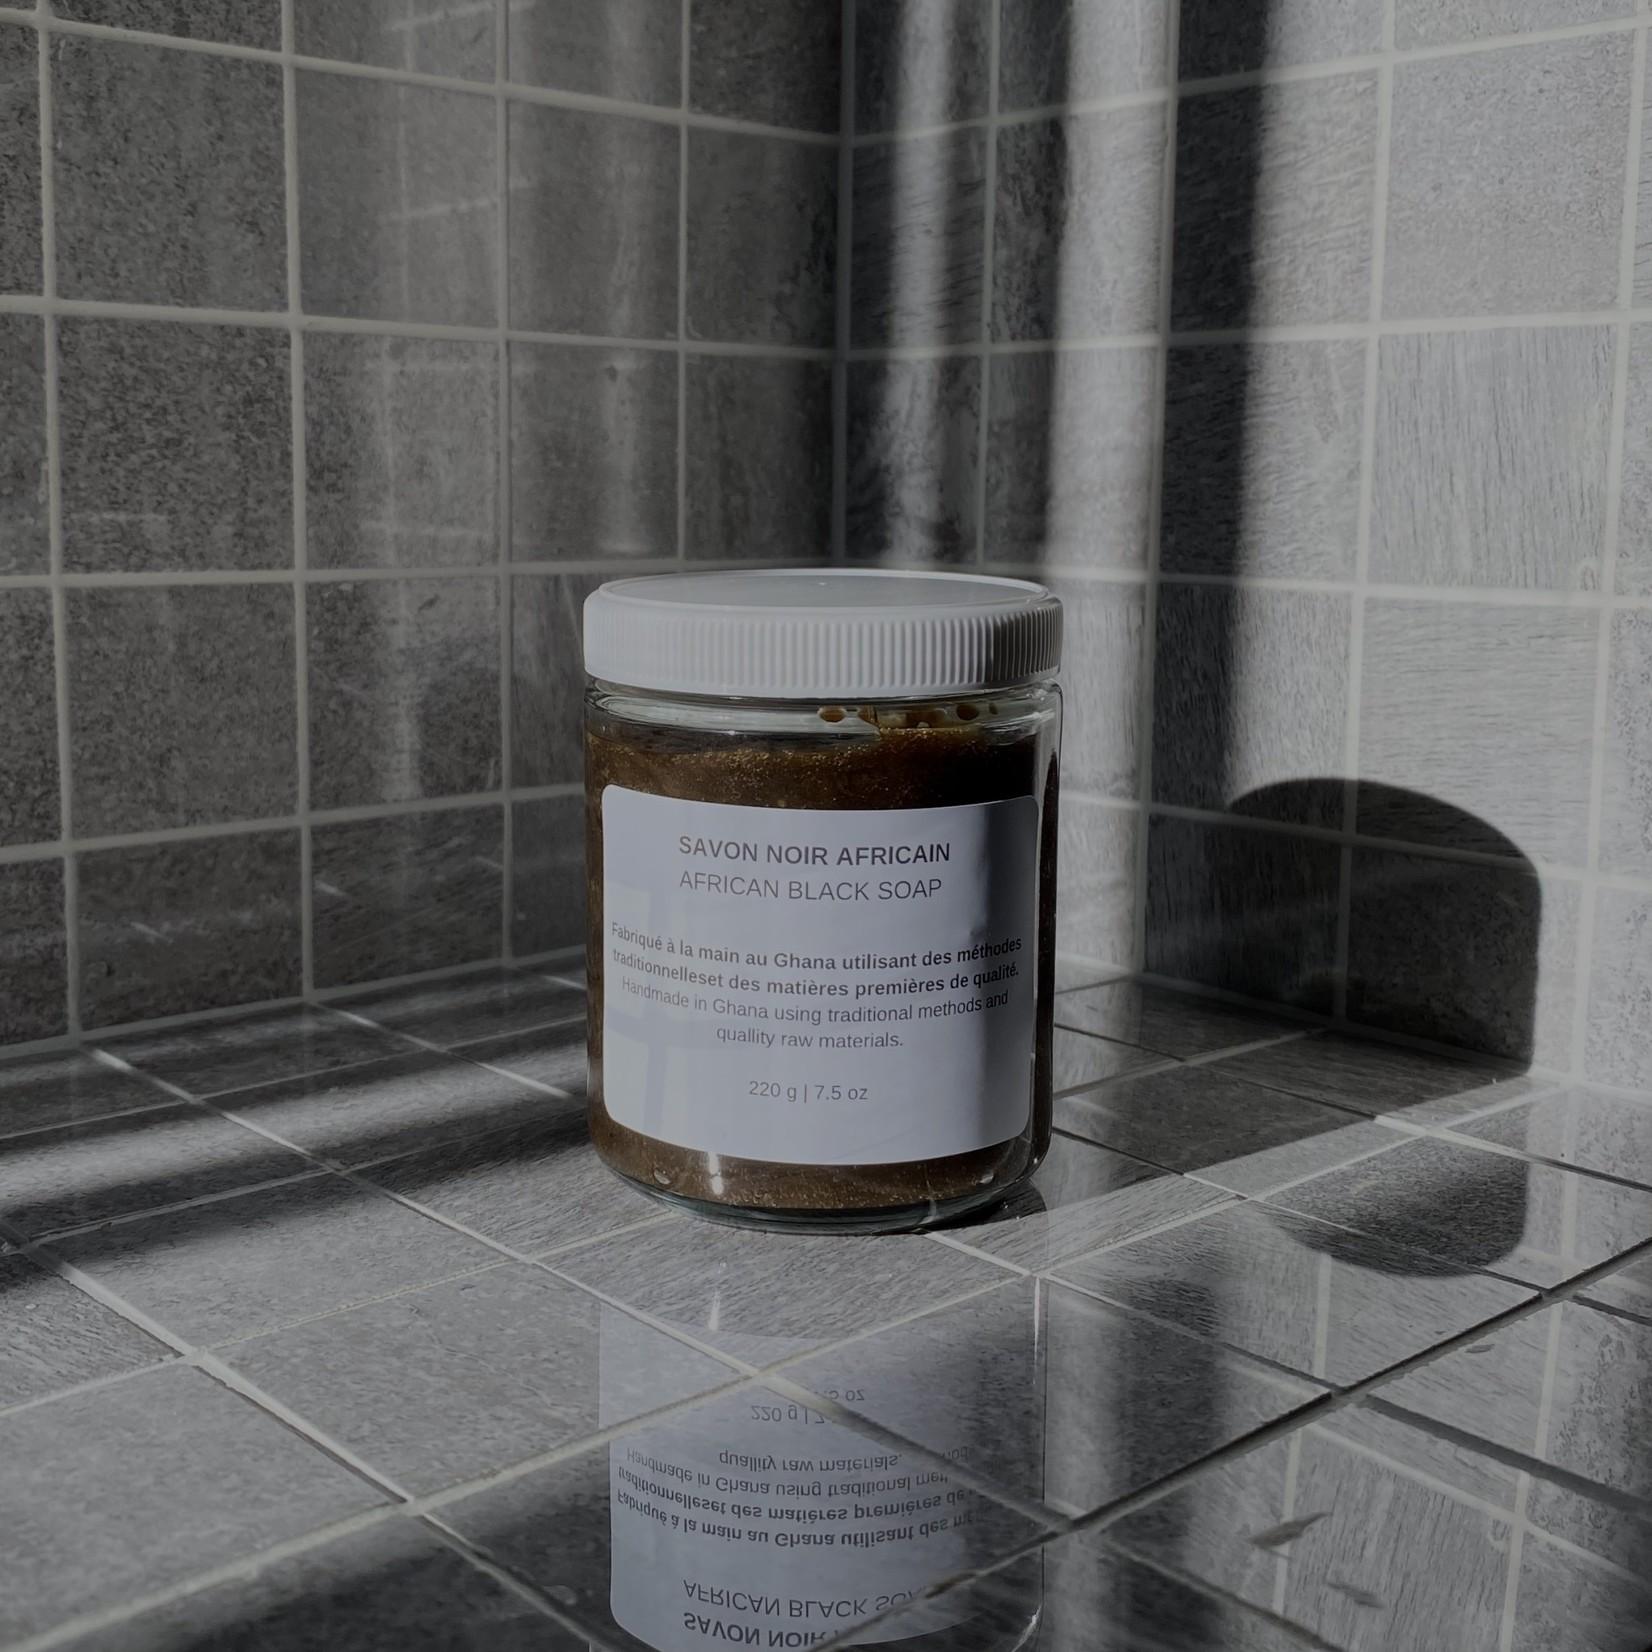 Puremoi soap factory Savon noir Africain 220g